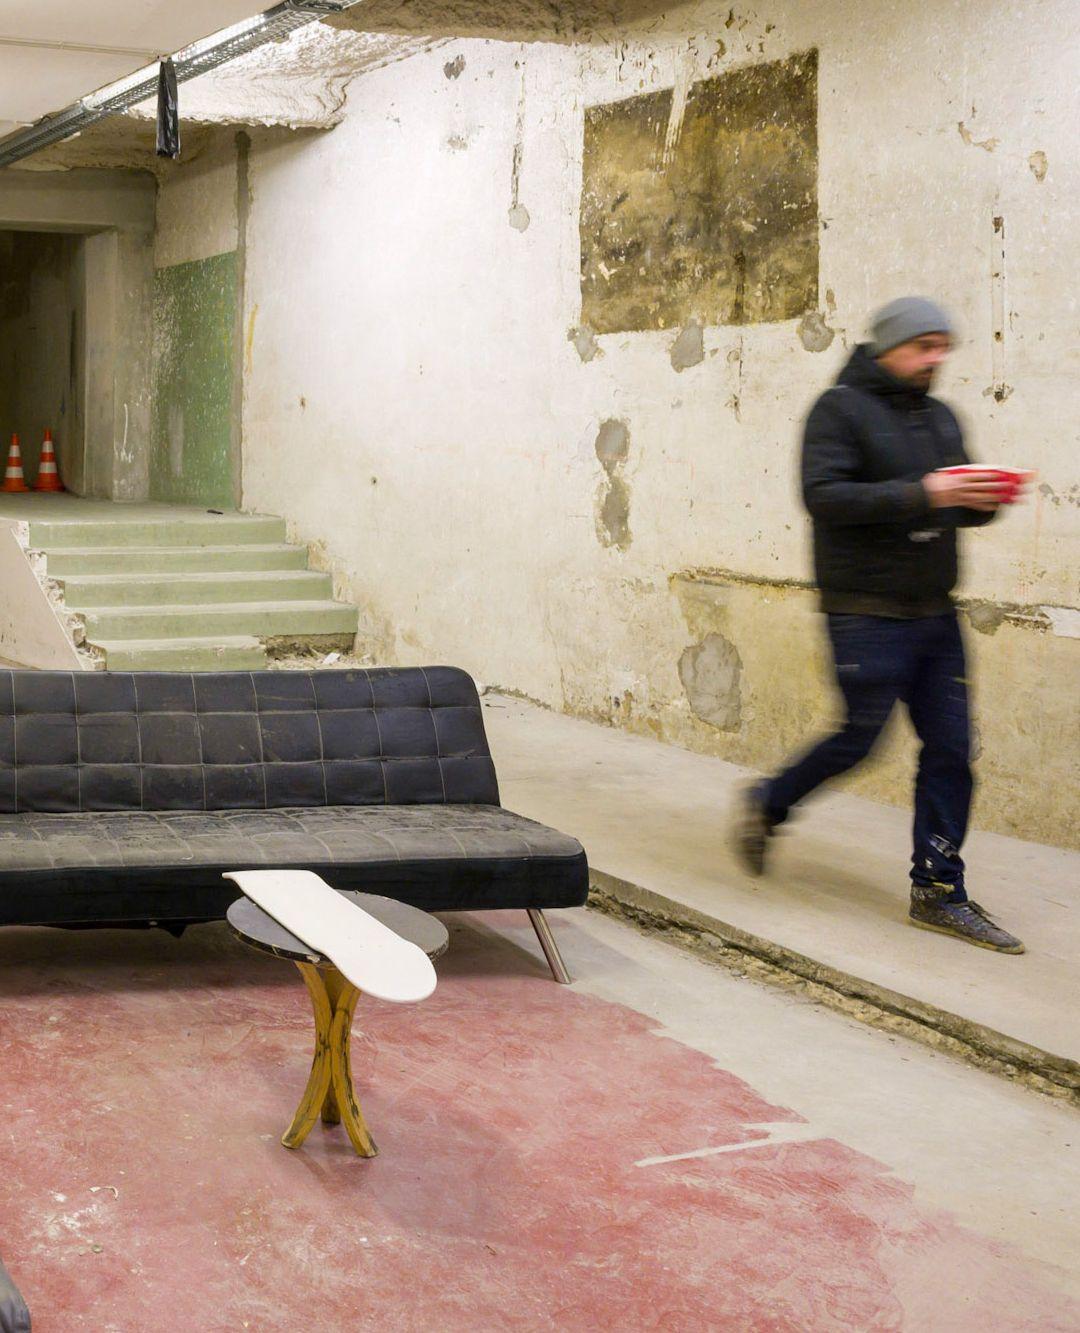 SPRAYING BOARD Exposition Skate X Art Urbain Revient A Lyon 9